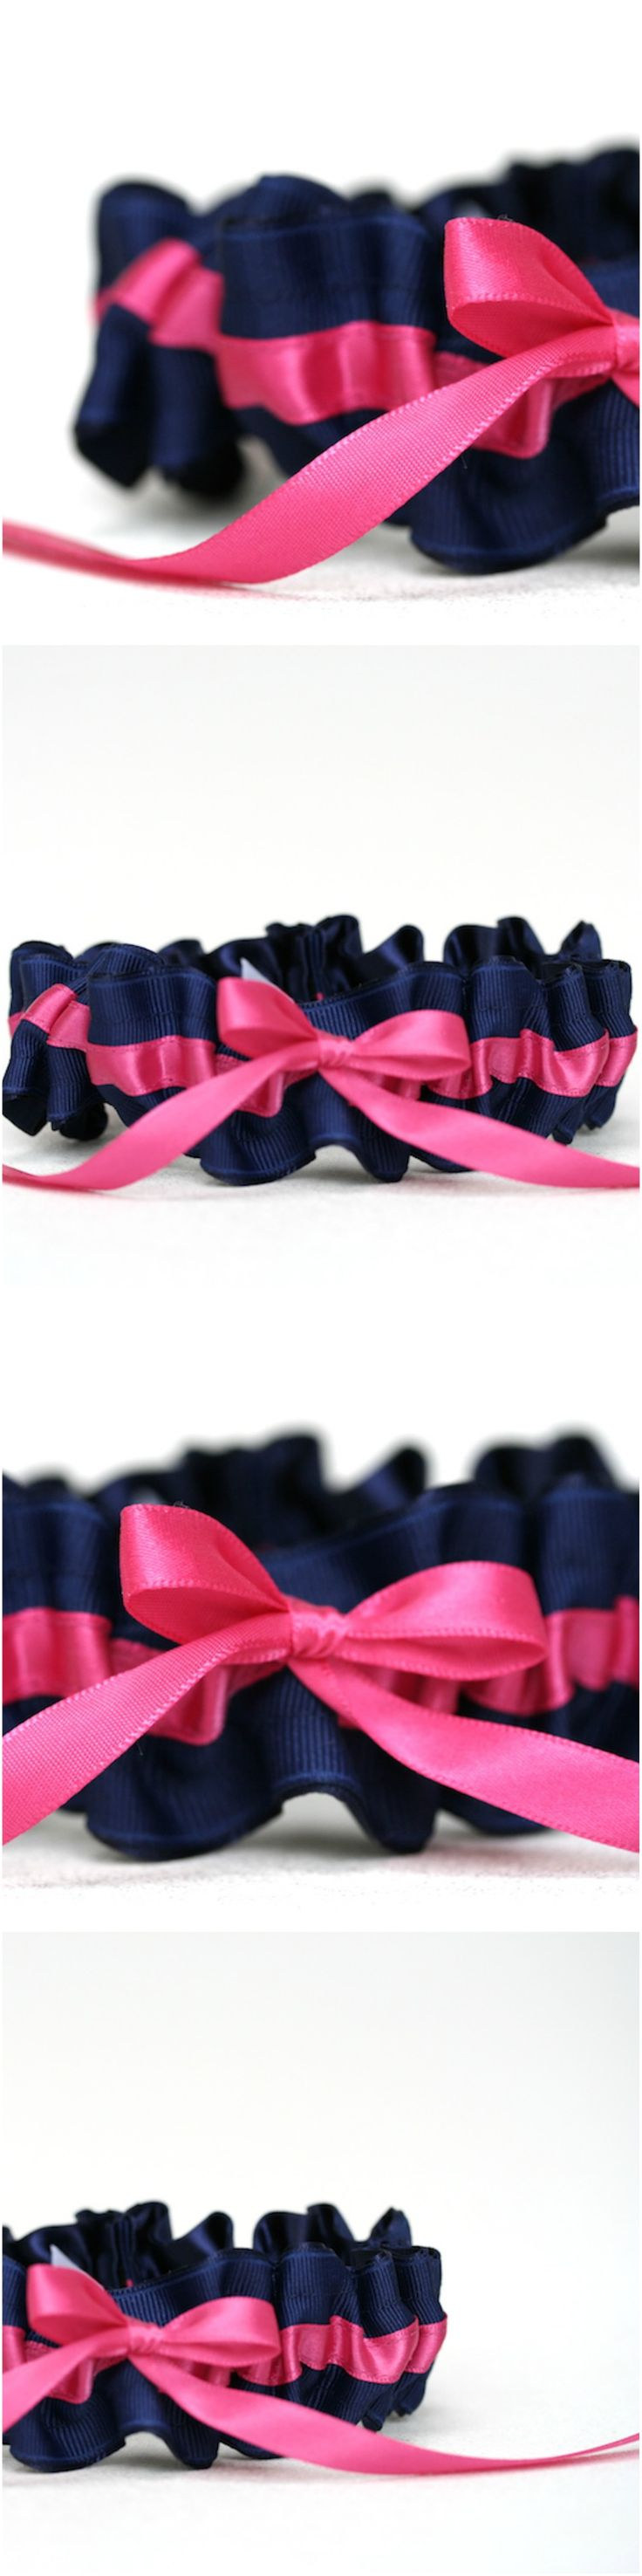 Custom Navy Blue and Hot Pink Wedding Garter-by The Garter Girl